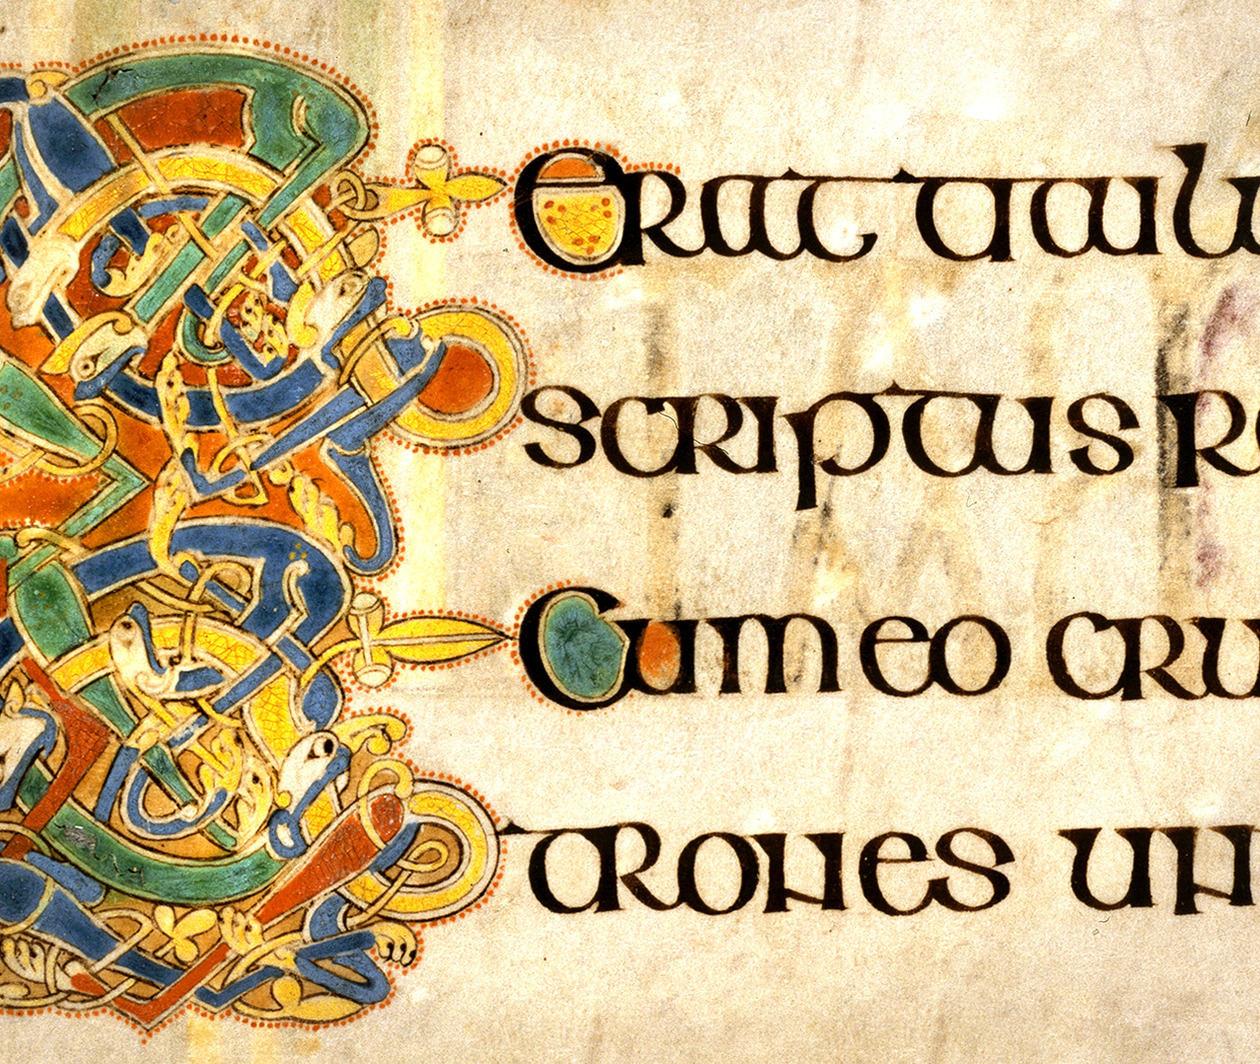 The Book of Kells: Exploring an Irish Medieval Masterpiece